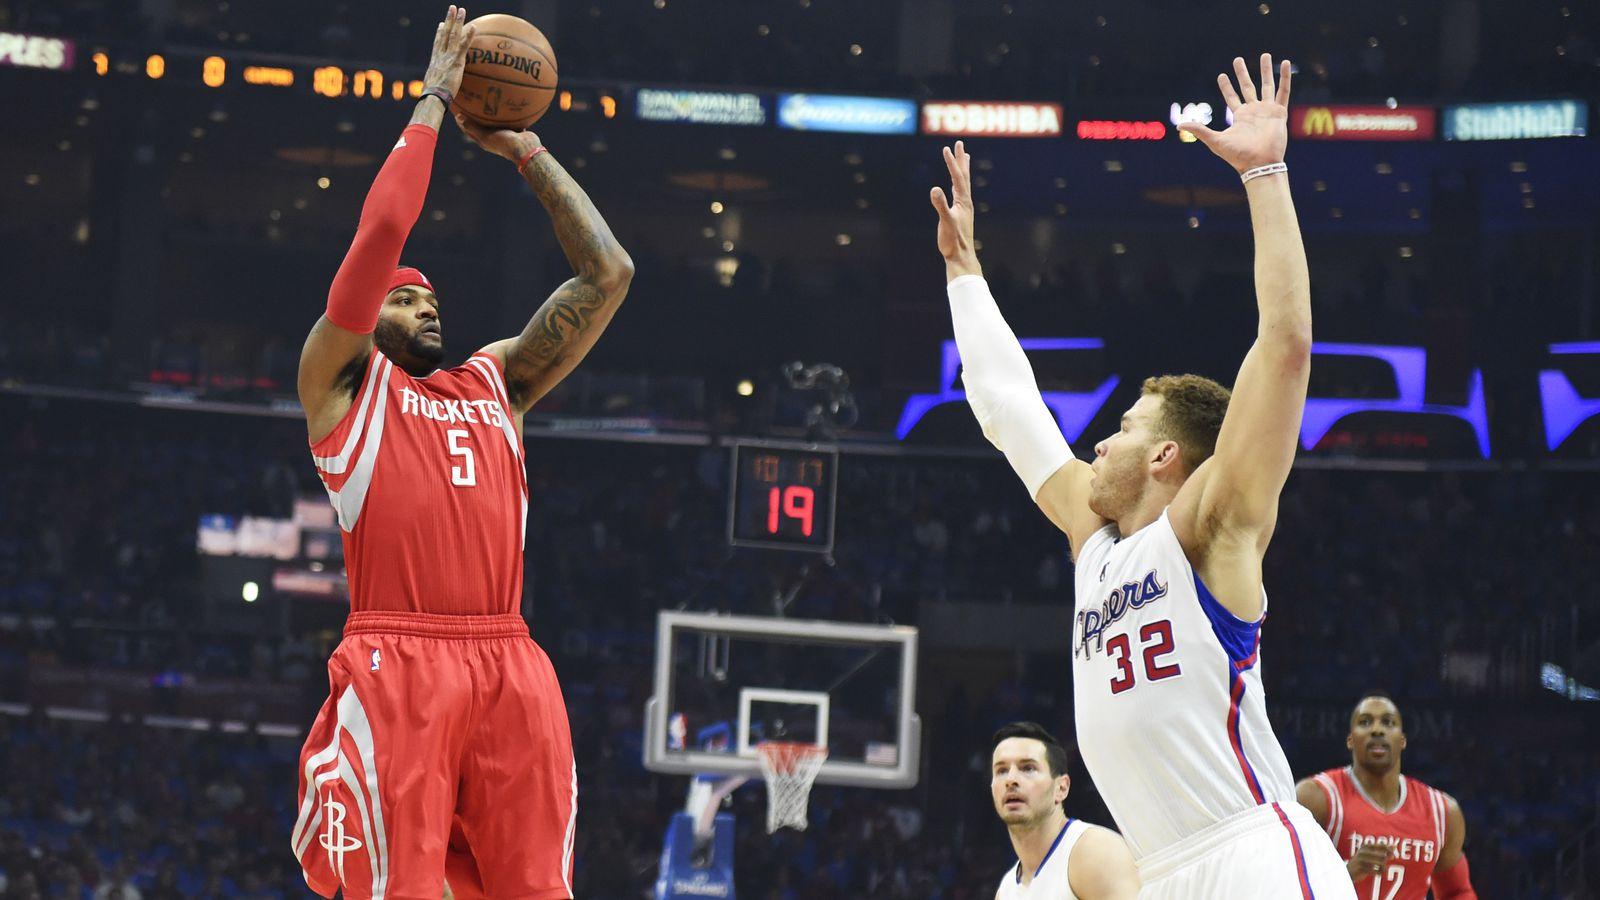 Rockets vs. Clippers Game 6 Final Score: Rockets force ...